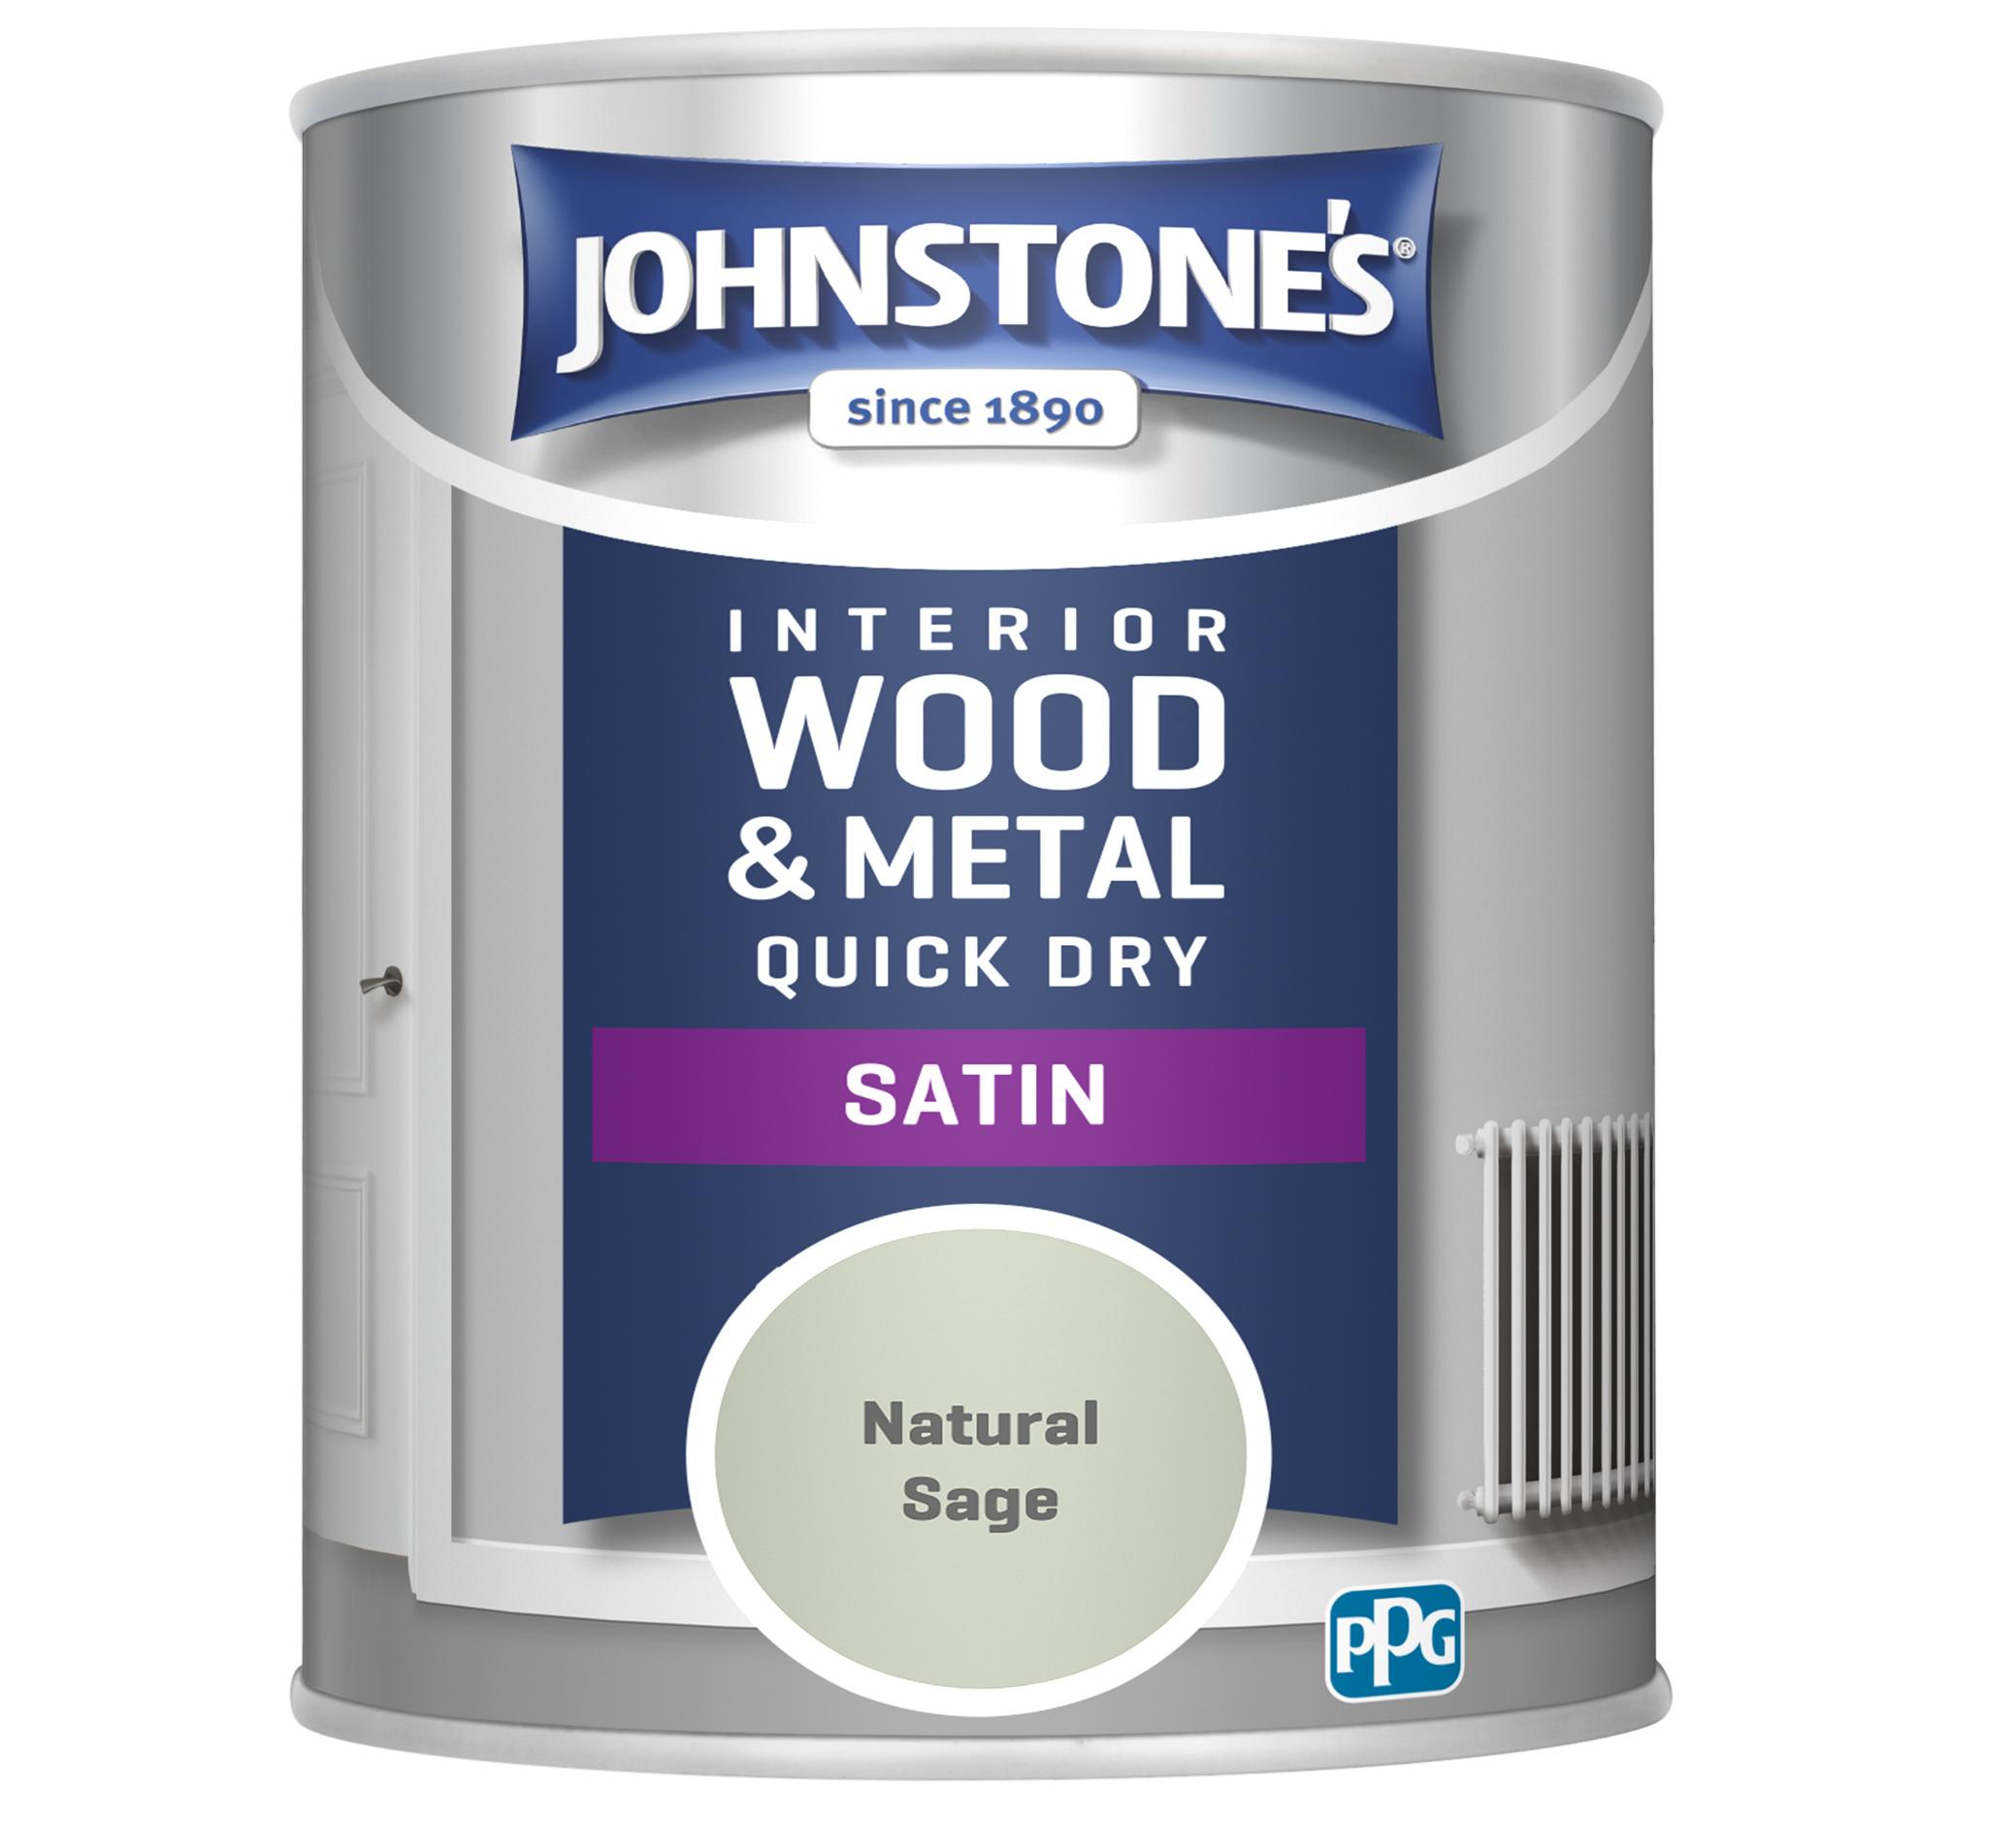 Johnstones 750ml Quick Dry Satin Paint - Natural Sage